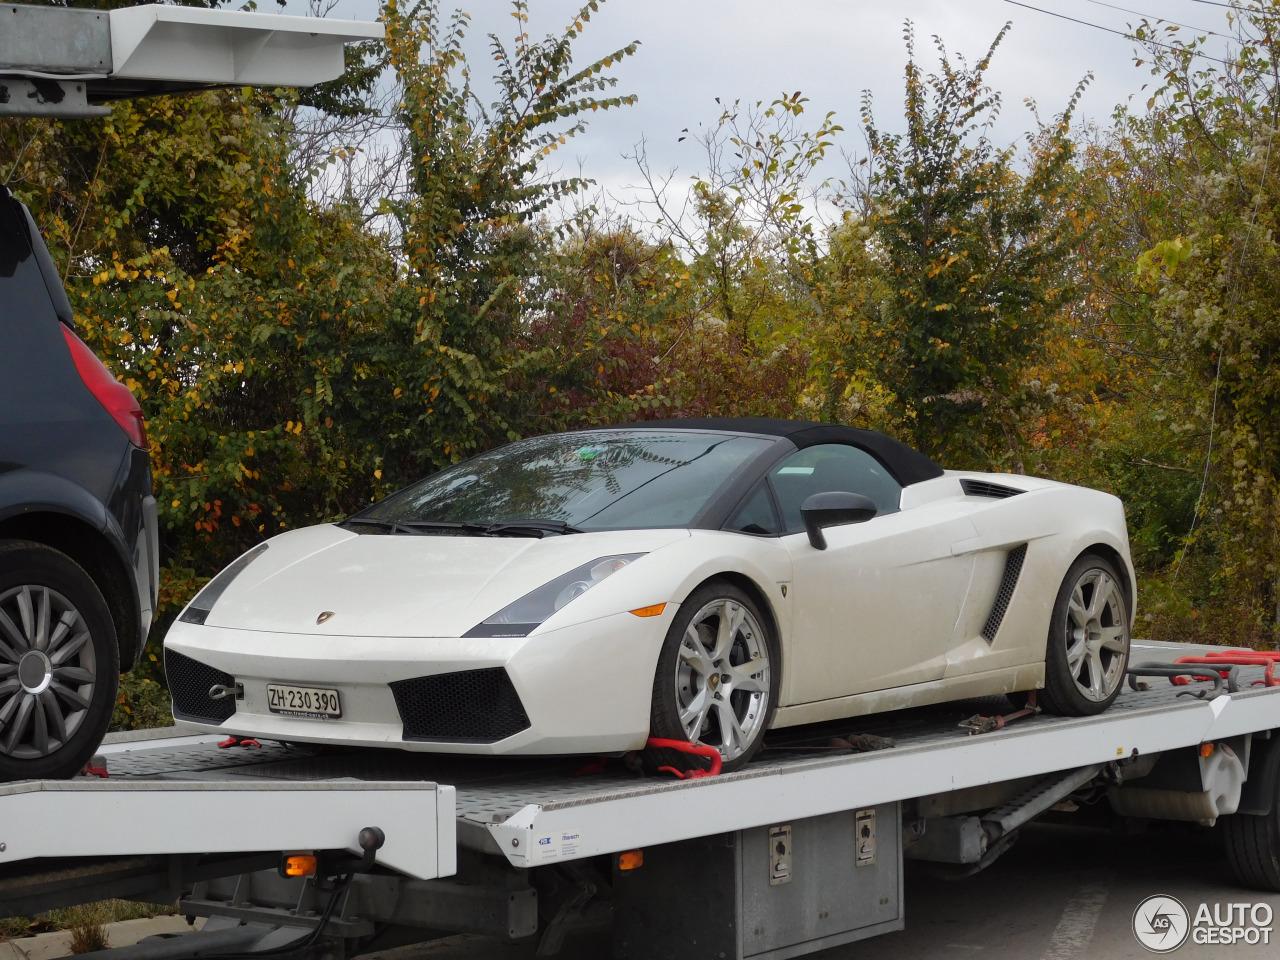 Lamborghini Gallardo Spyder 30 January 2018 Autogespot